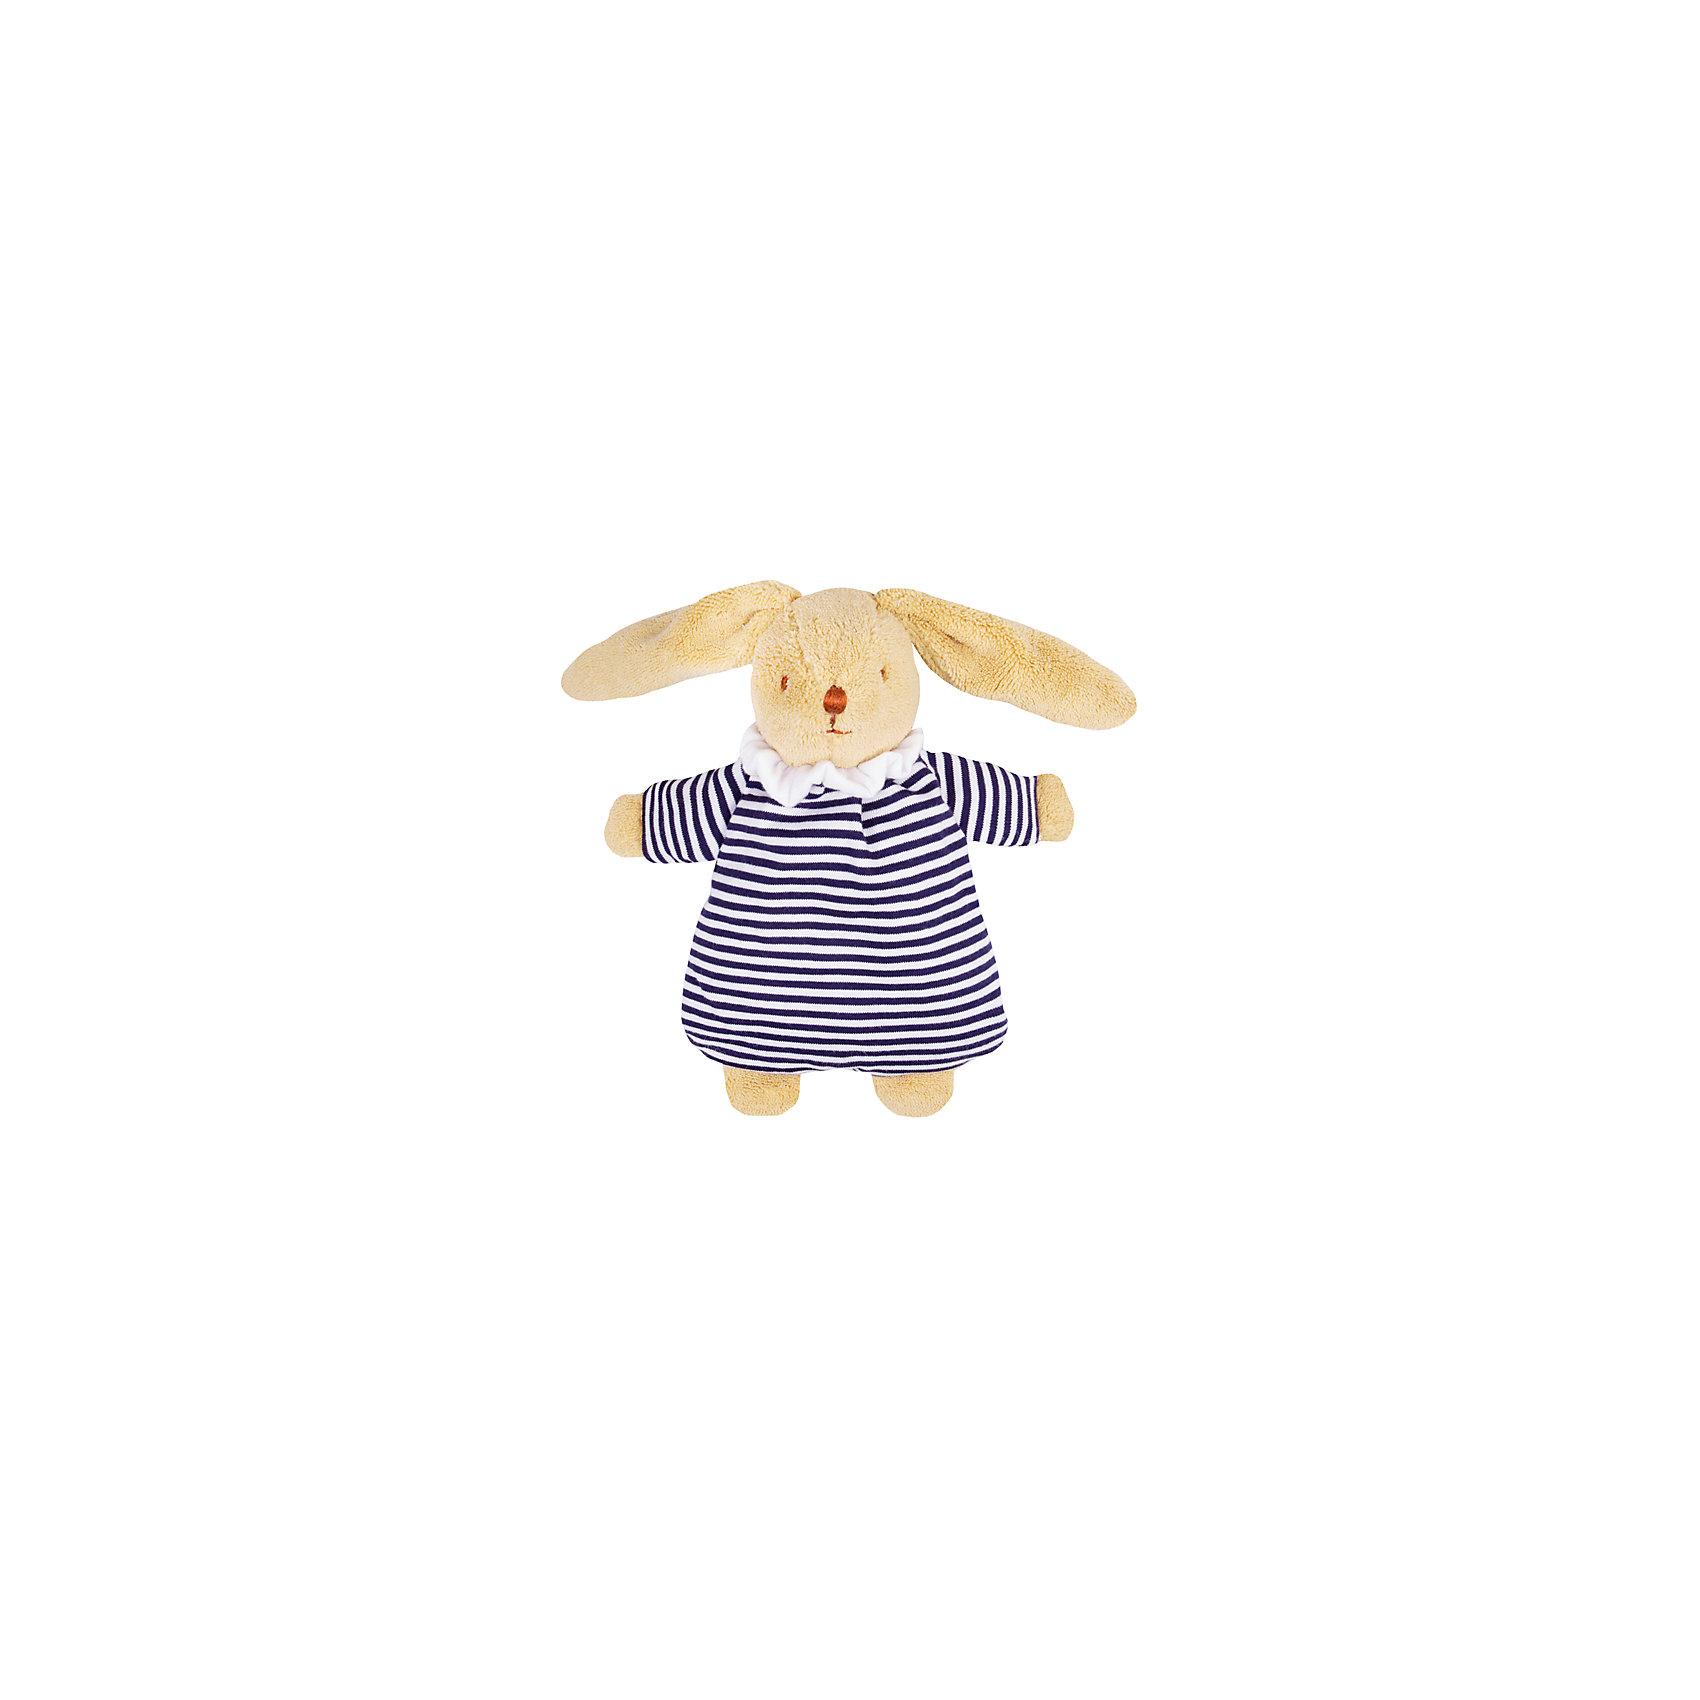 TROUSSELIER Мягкая погремушка Зайка, 20см, Trousselier trousselier мягкая игрушка зайка с музыкой розовый 25см trousselier